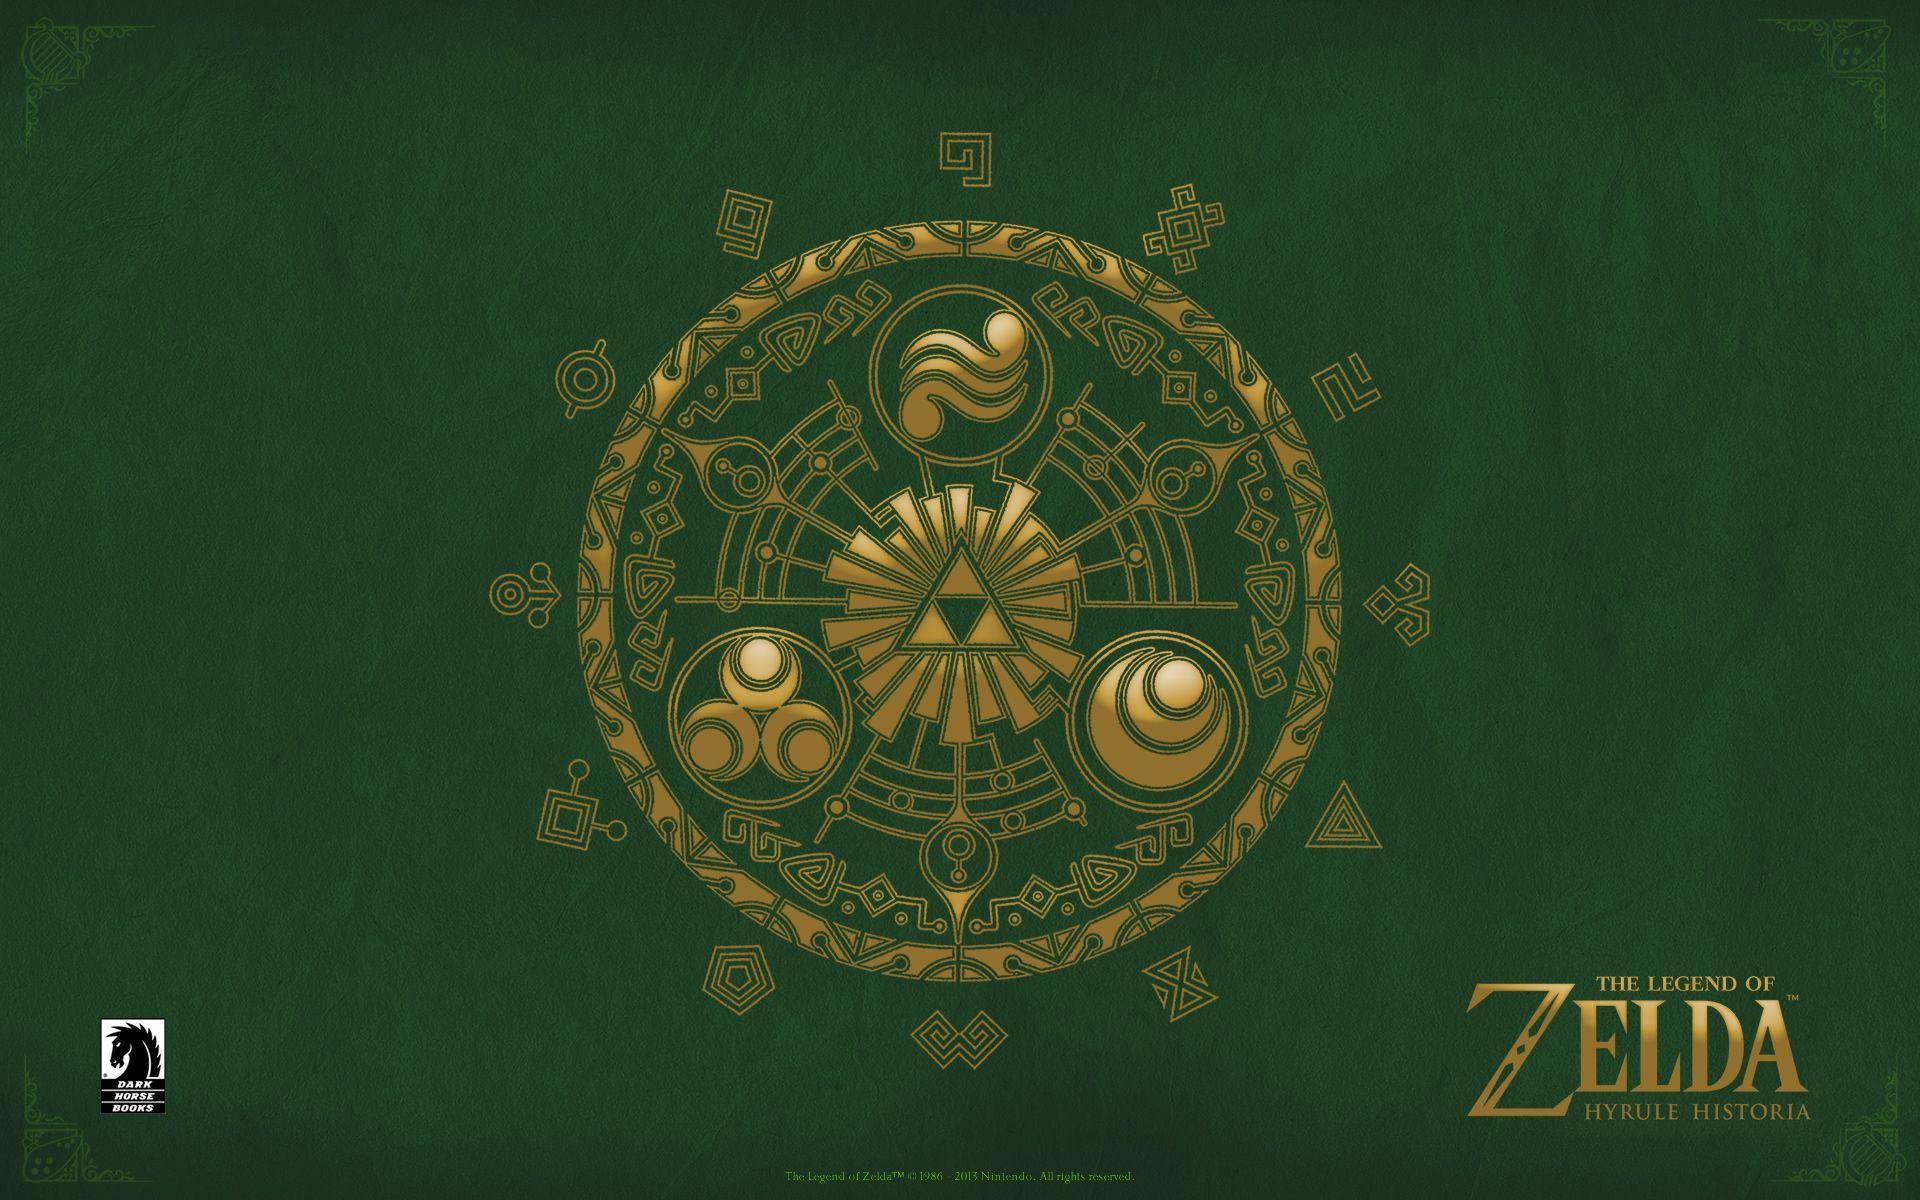 Zelda1 Mag Jpg 1920 1200 I Love The Circular Semi Celtic Look Of The Iconography In This Picture Legend Of Zelda Zelda Legend